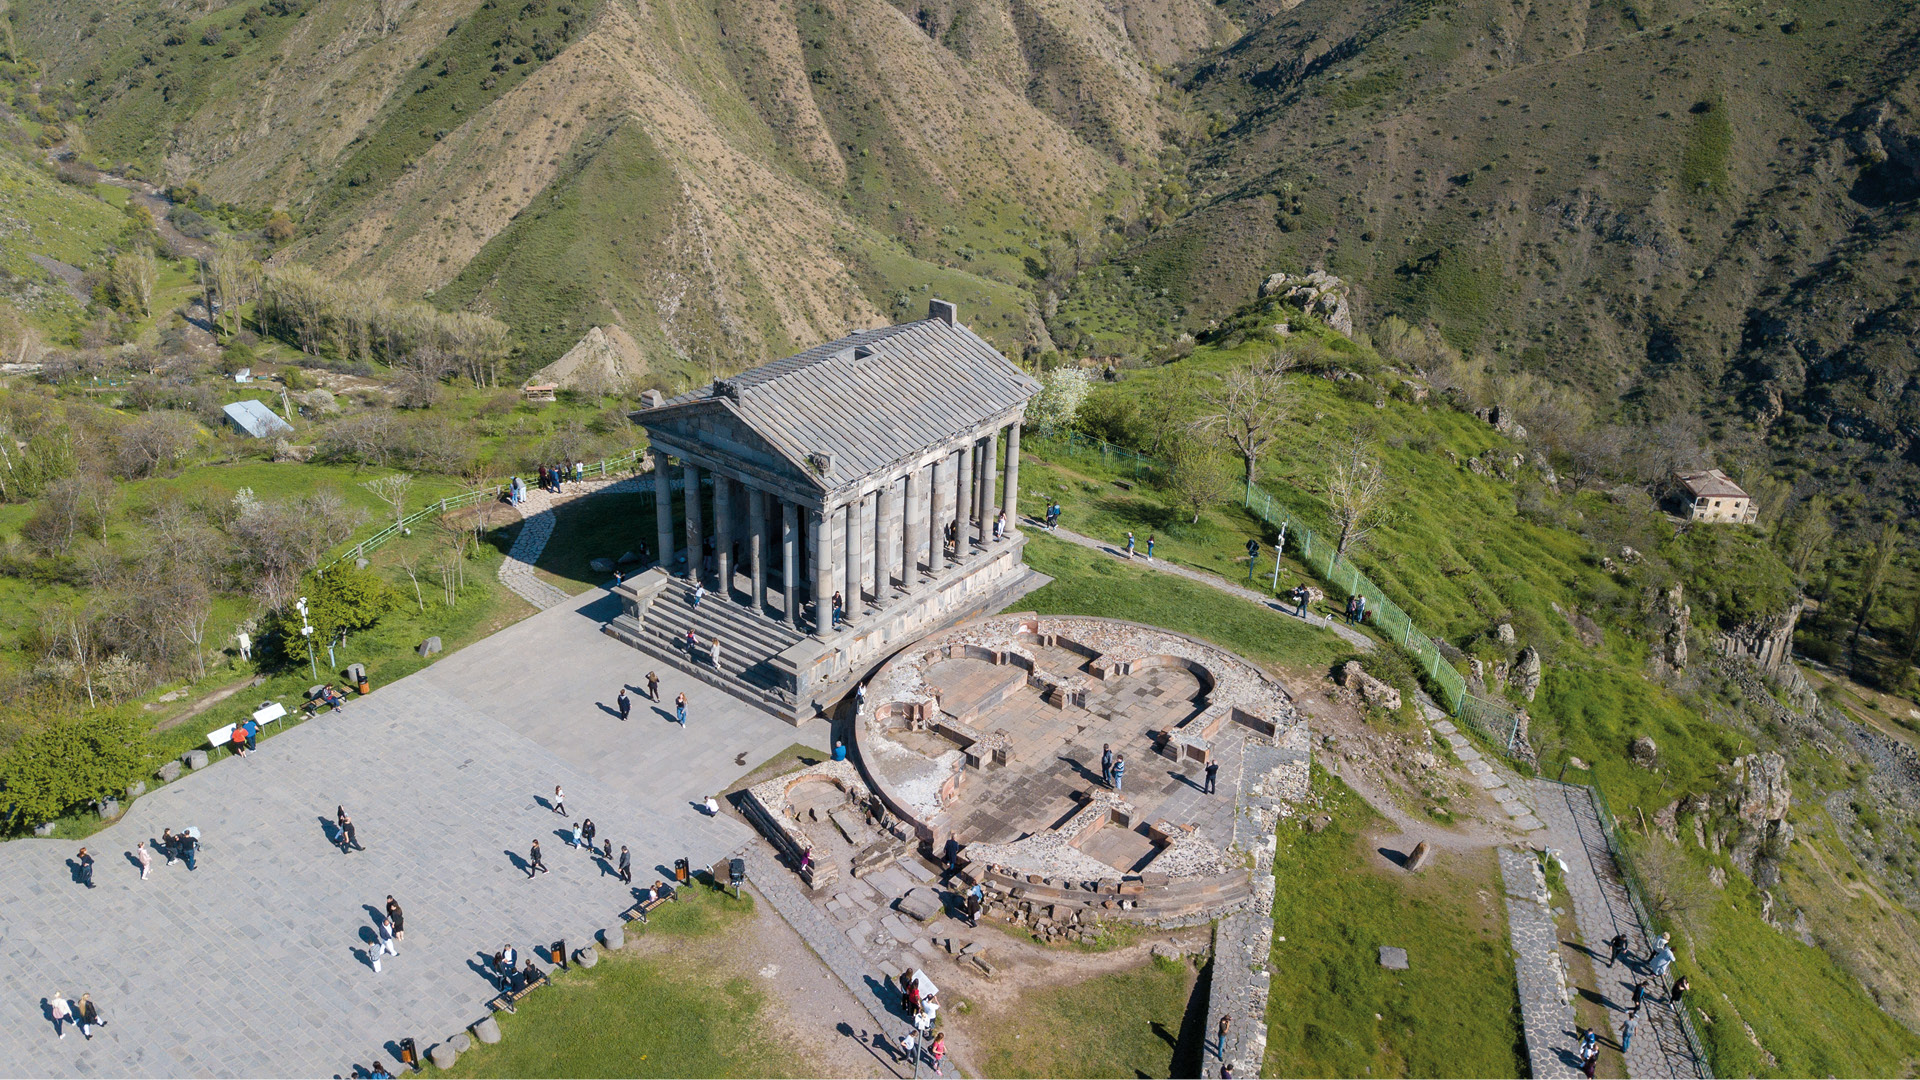 Garni tempel en Geghard klooster, Armenië